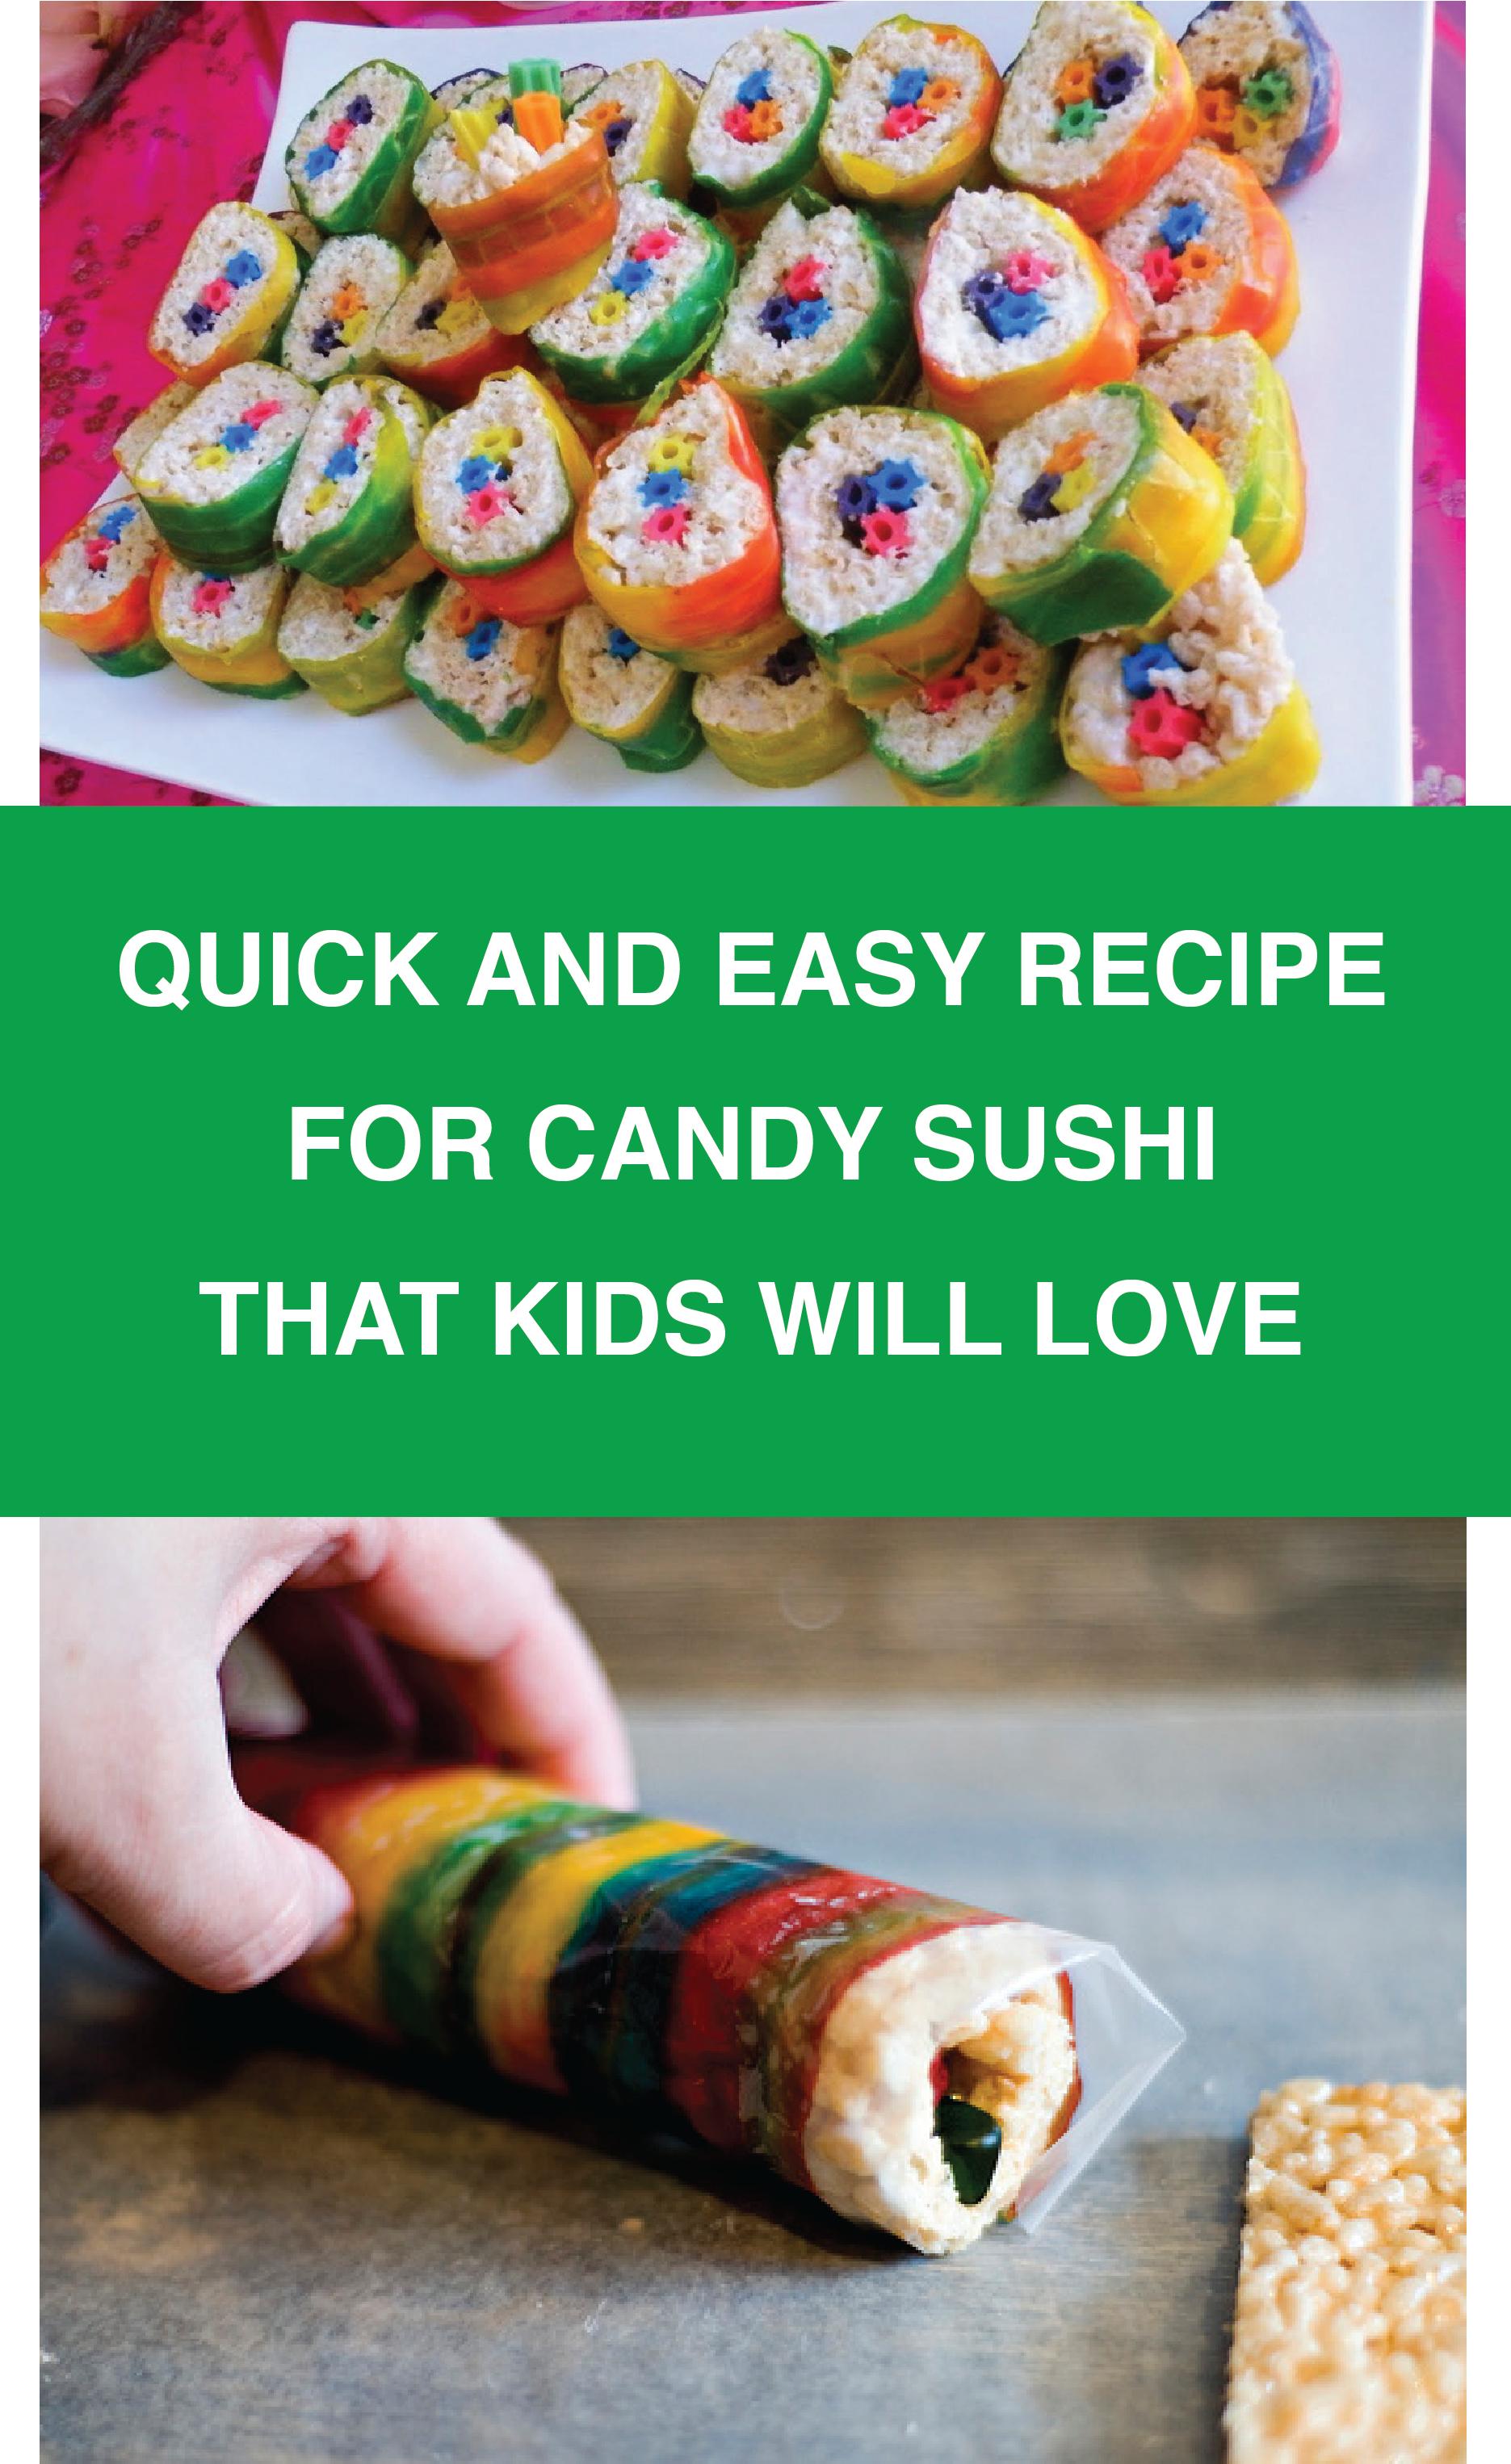 Desserts to make with kids